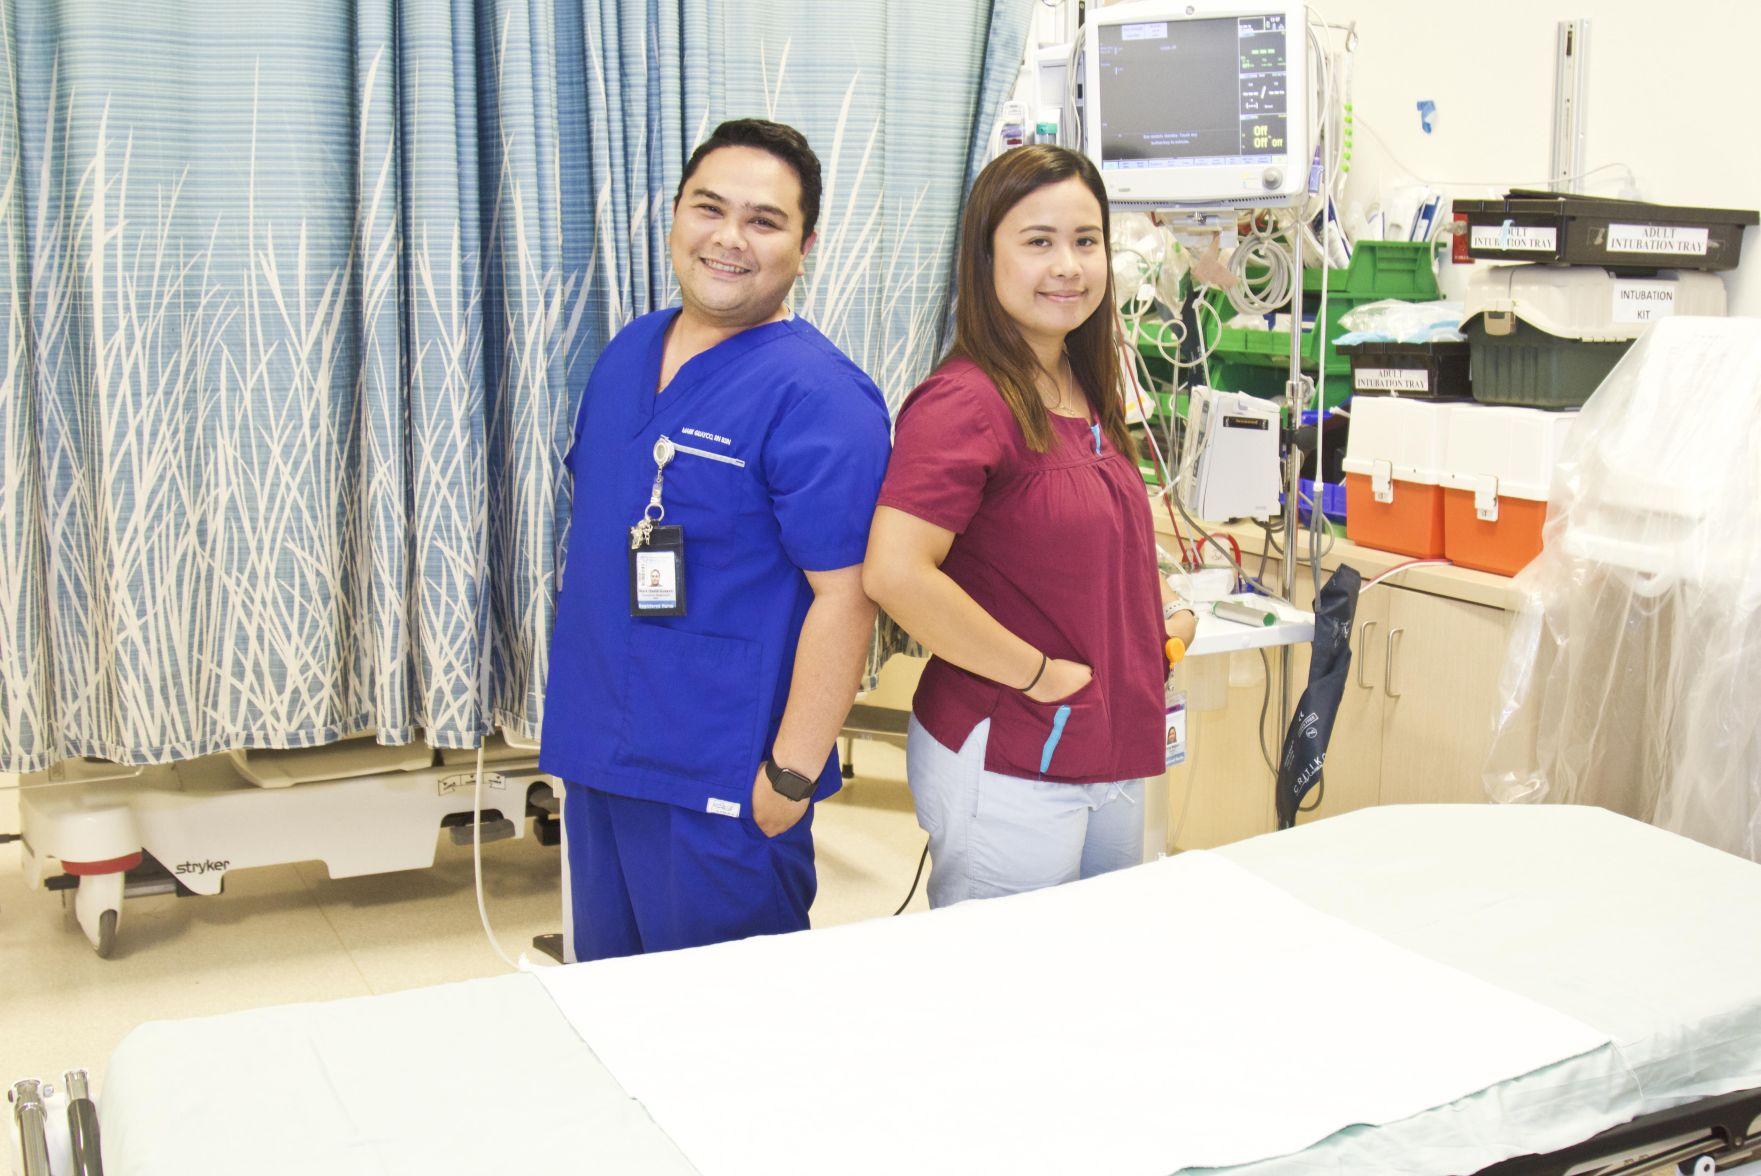 Nurses The heart of a hospital 1